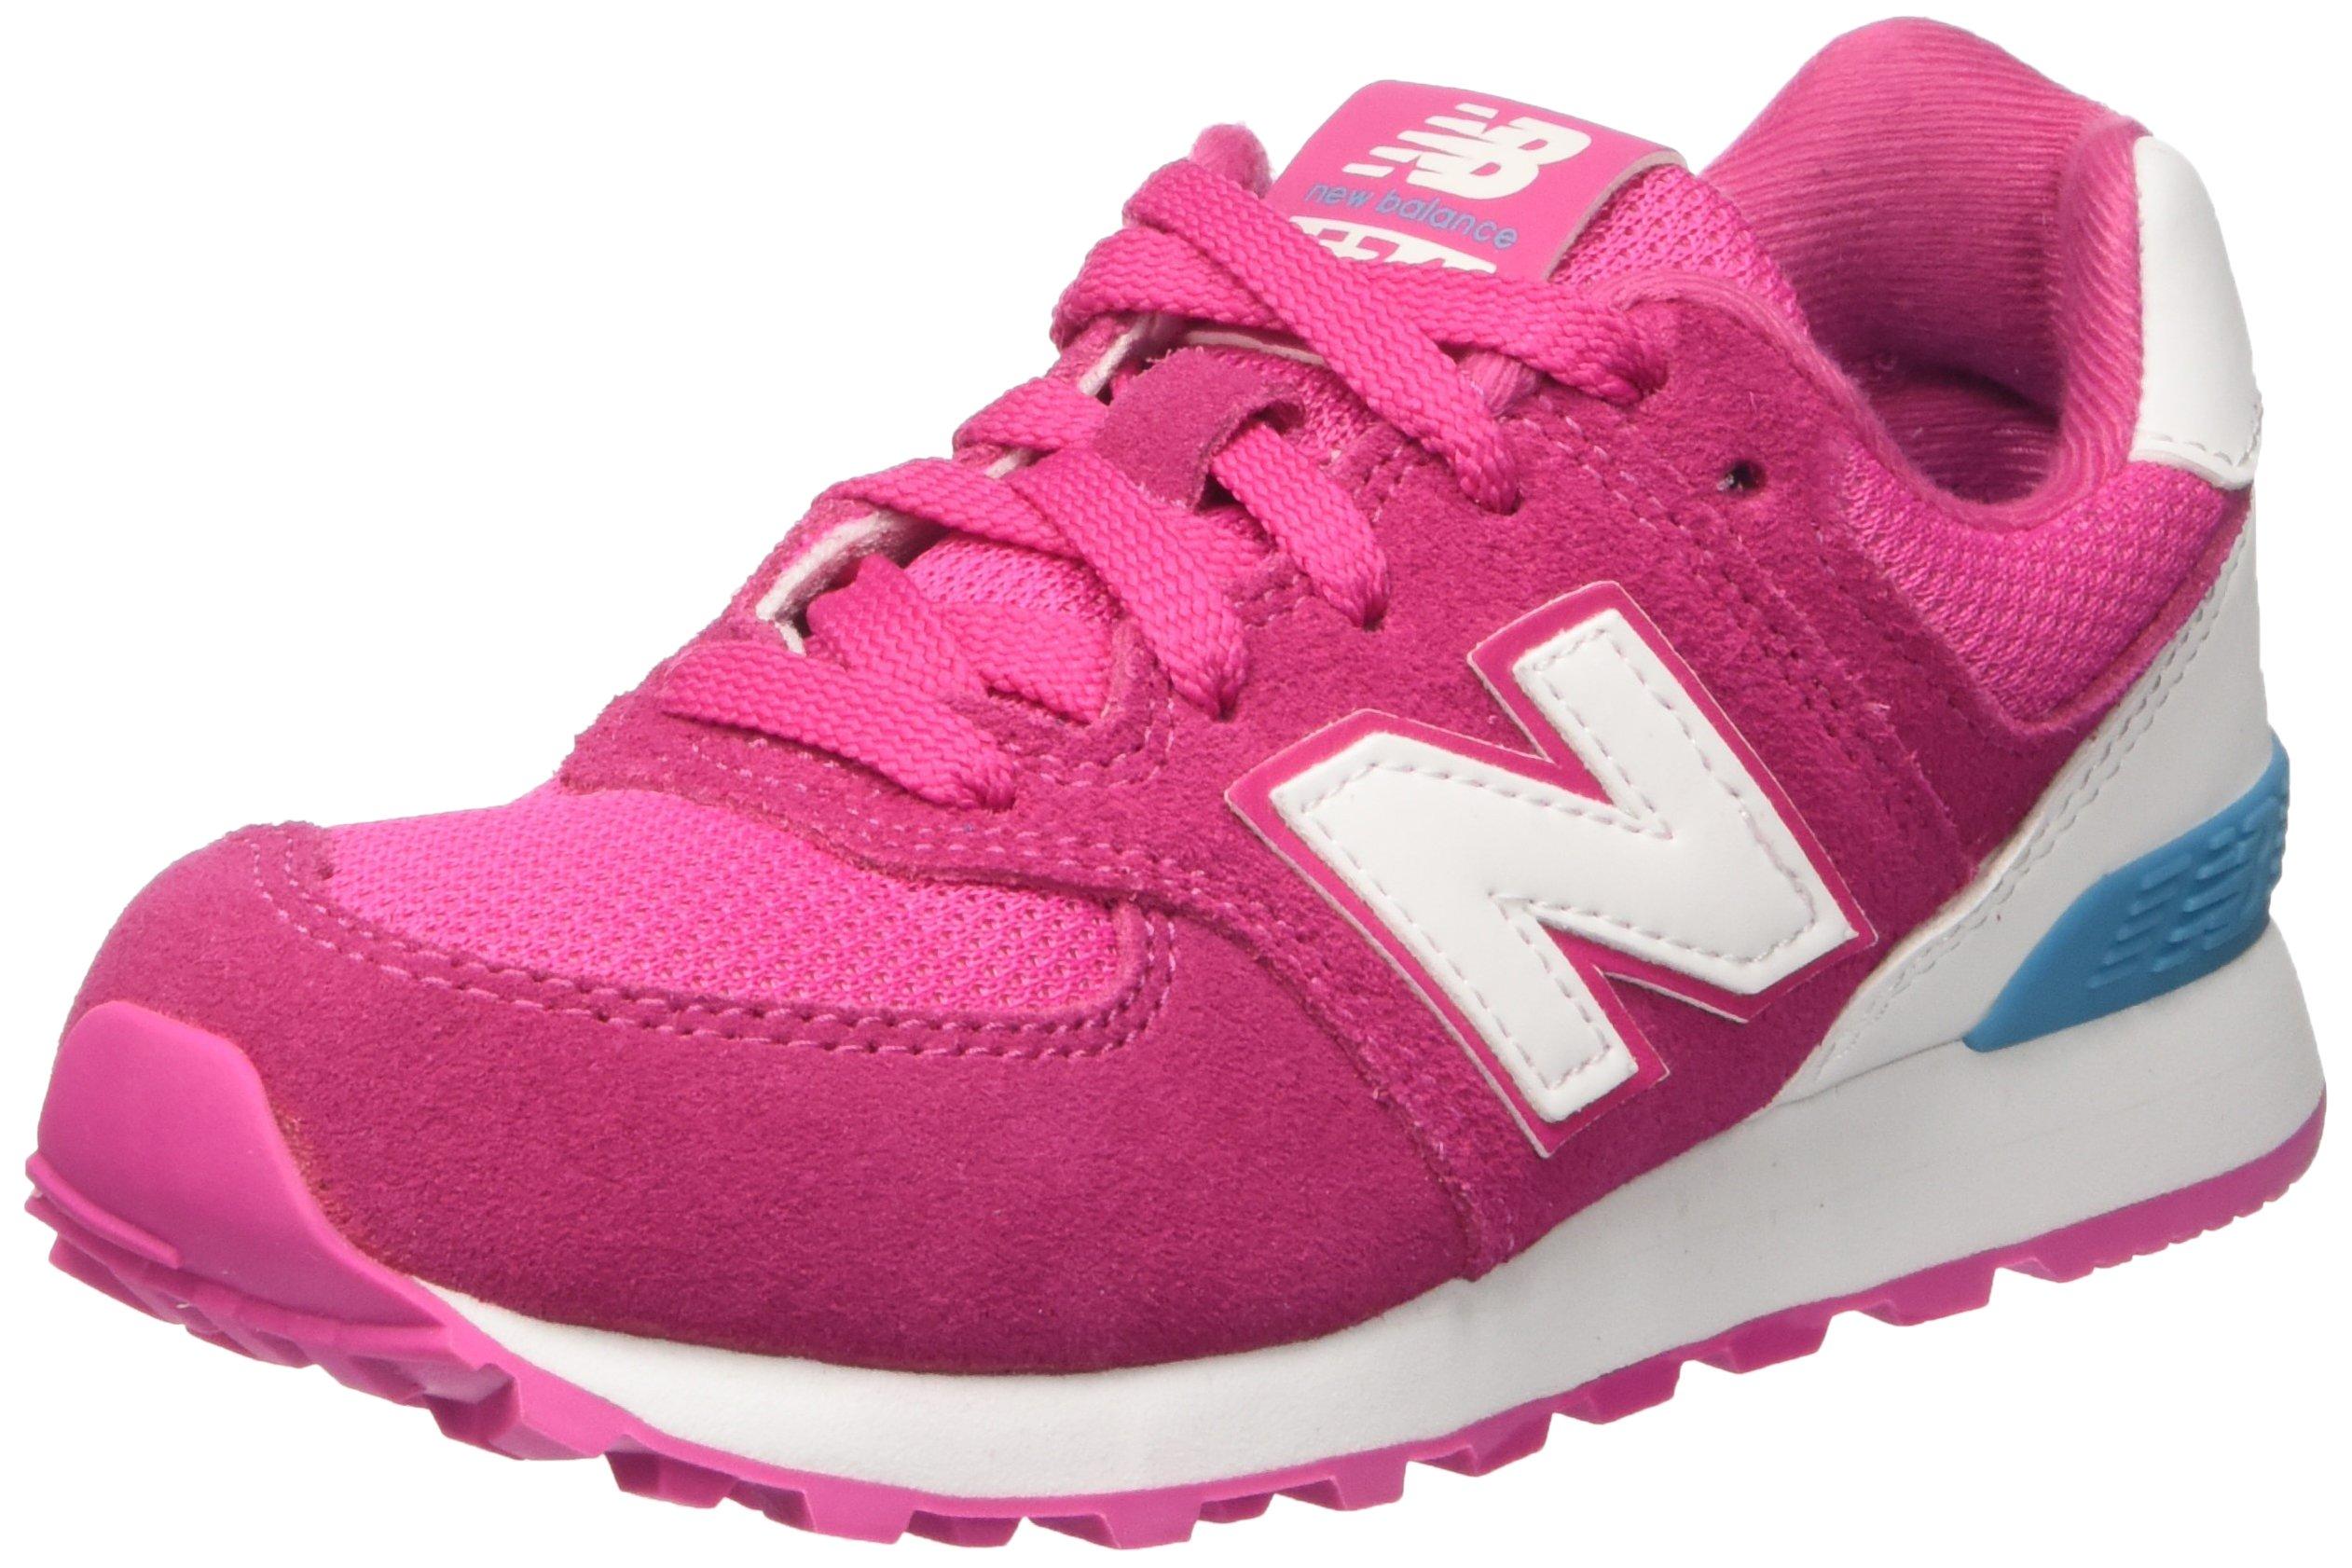 New Balance Girls' KL574 Sneaker, Pink/White, 4 M